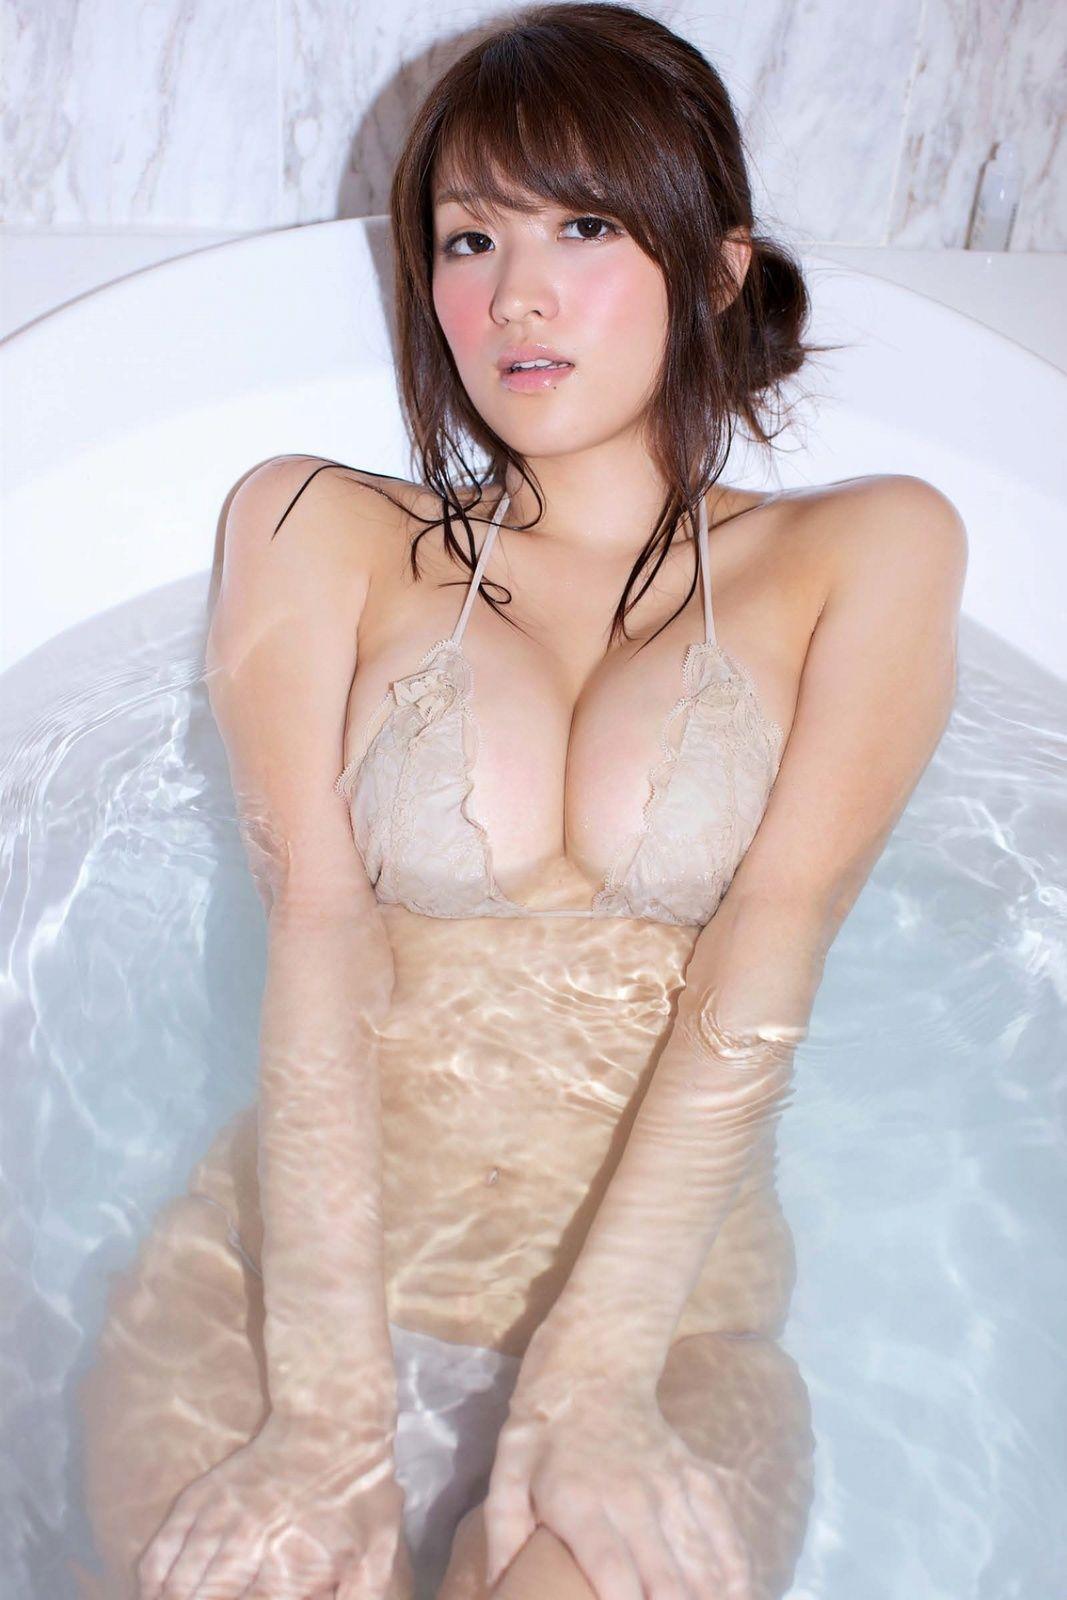 Japan Girl Beautiful Woman Sex Sexy Hot Body Beautiful Cute Asian Girl